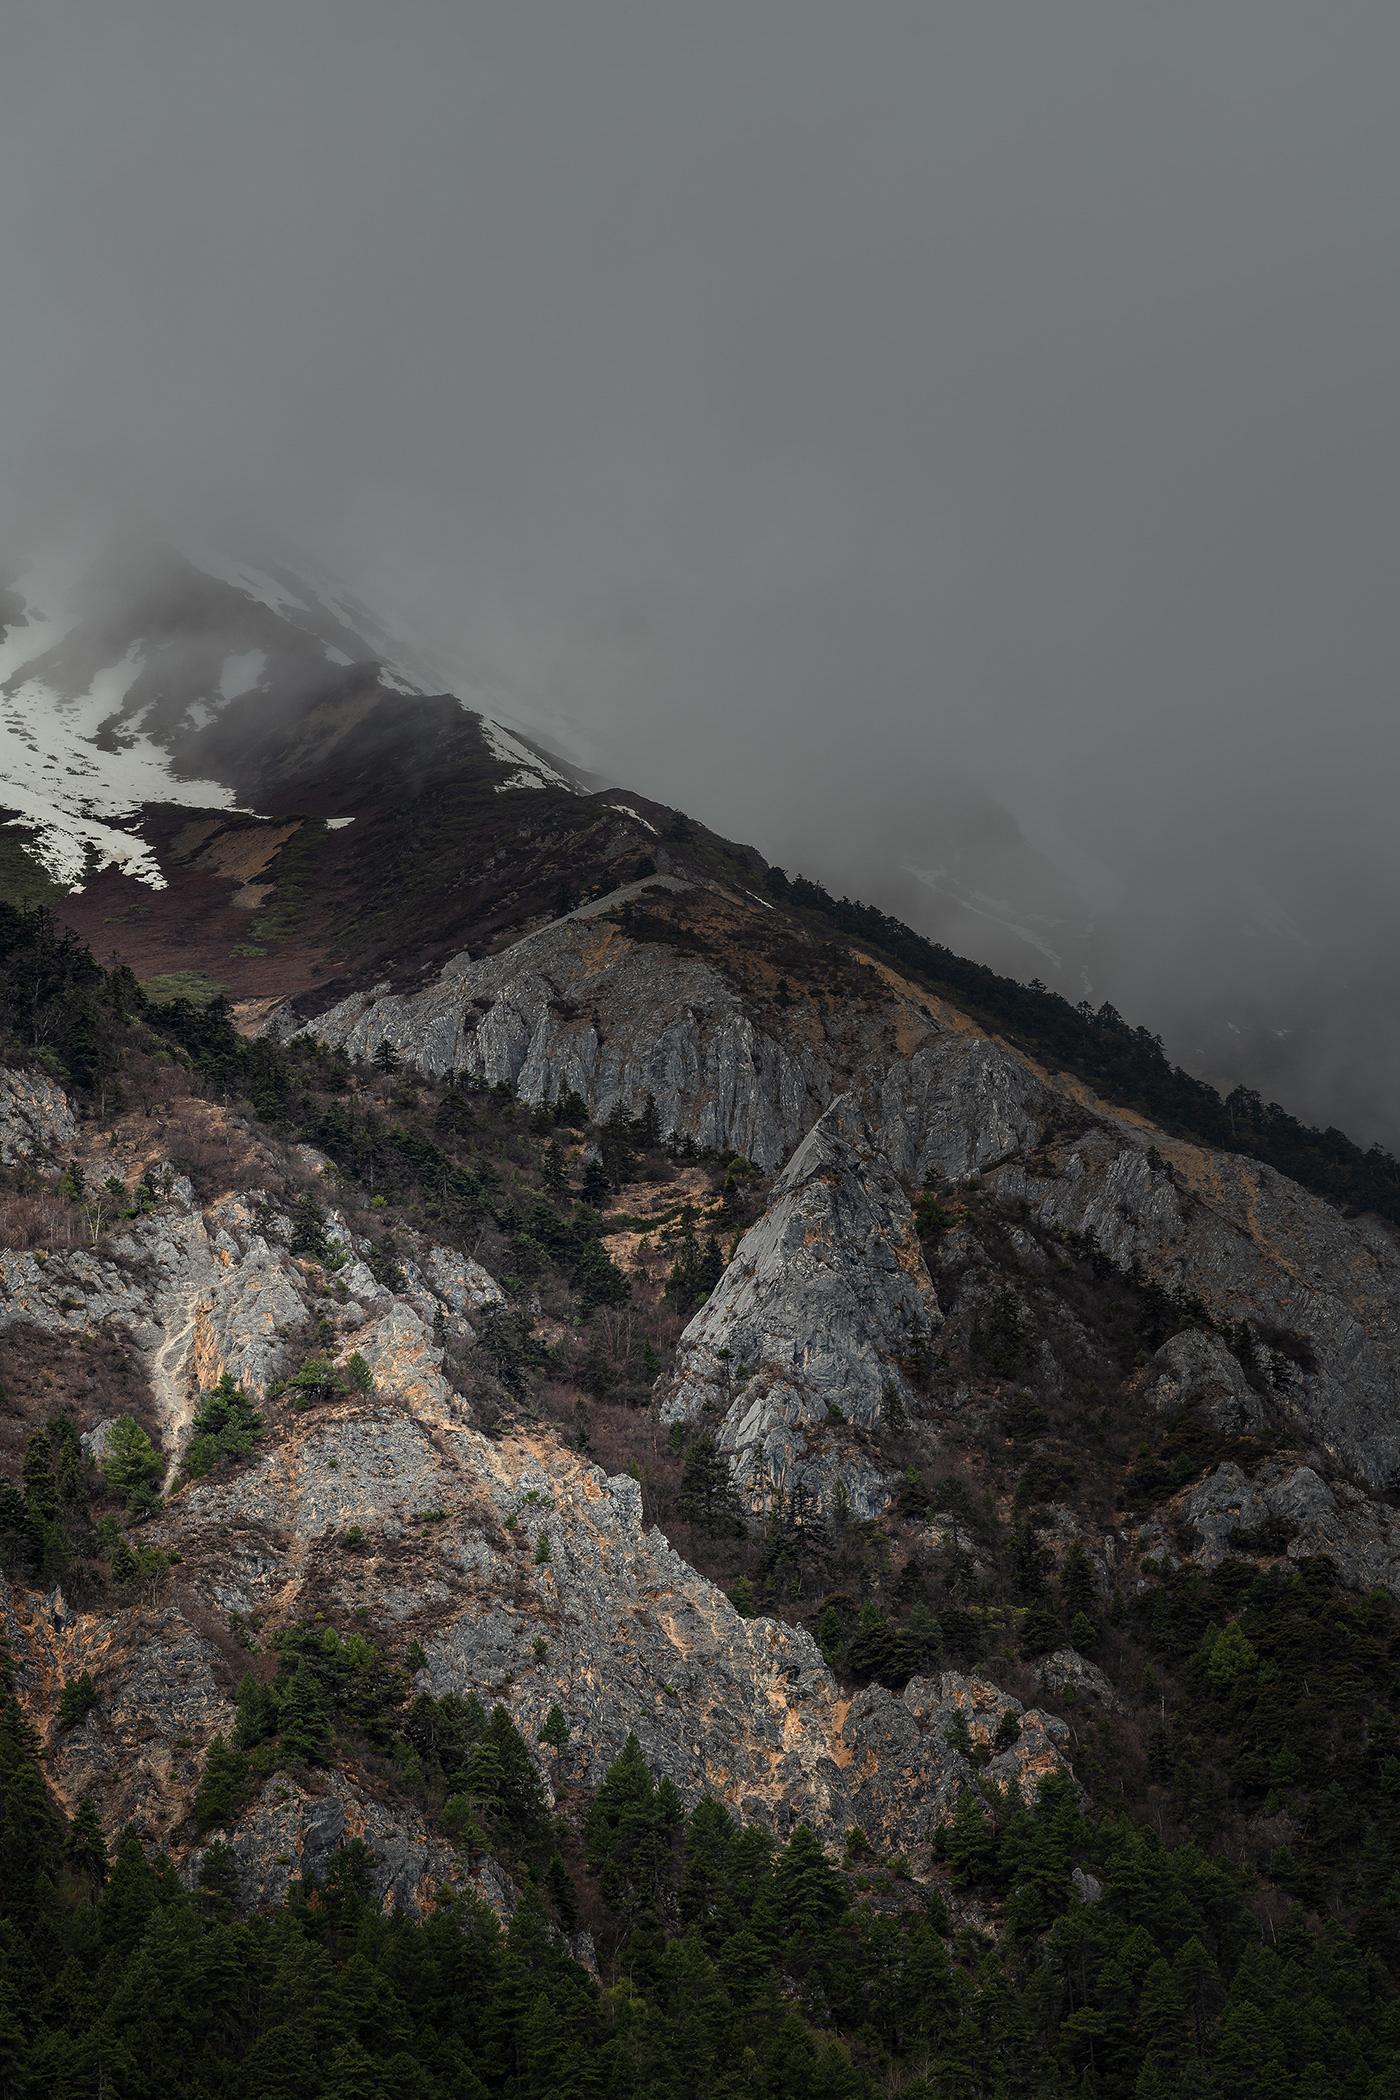 Landscape Massif Moody mountain Nature Outdoor tibet Travel